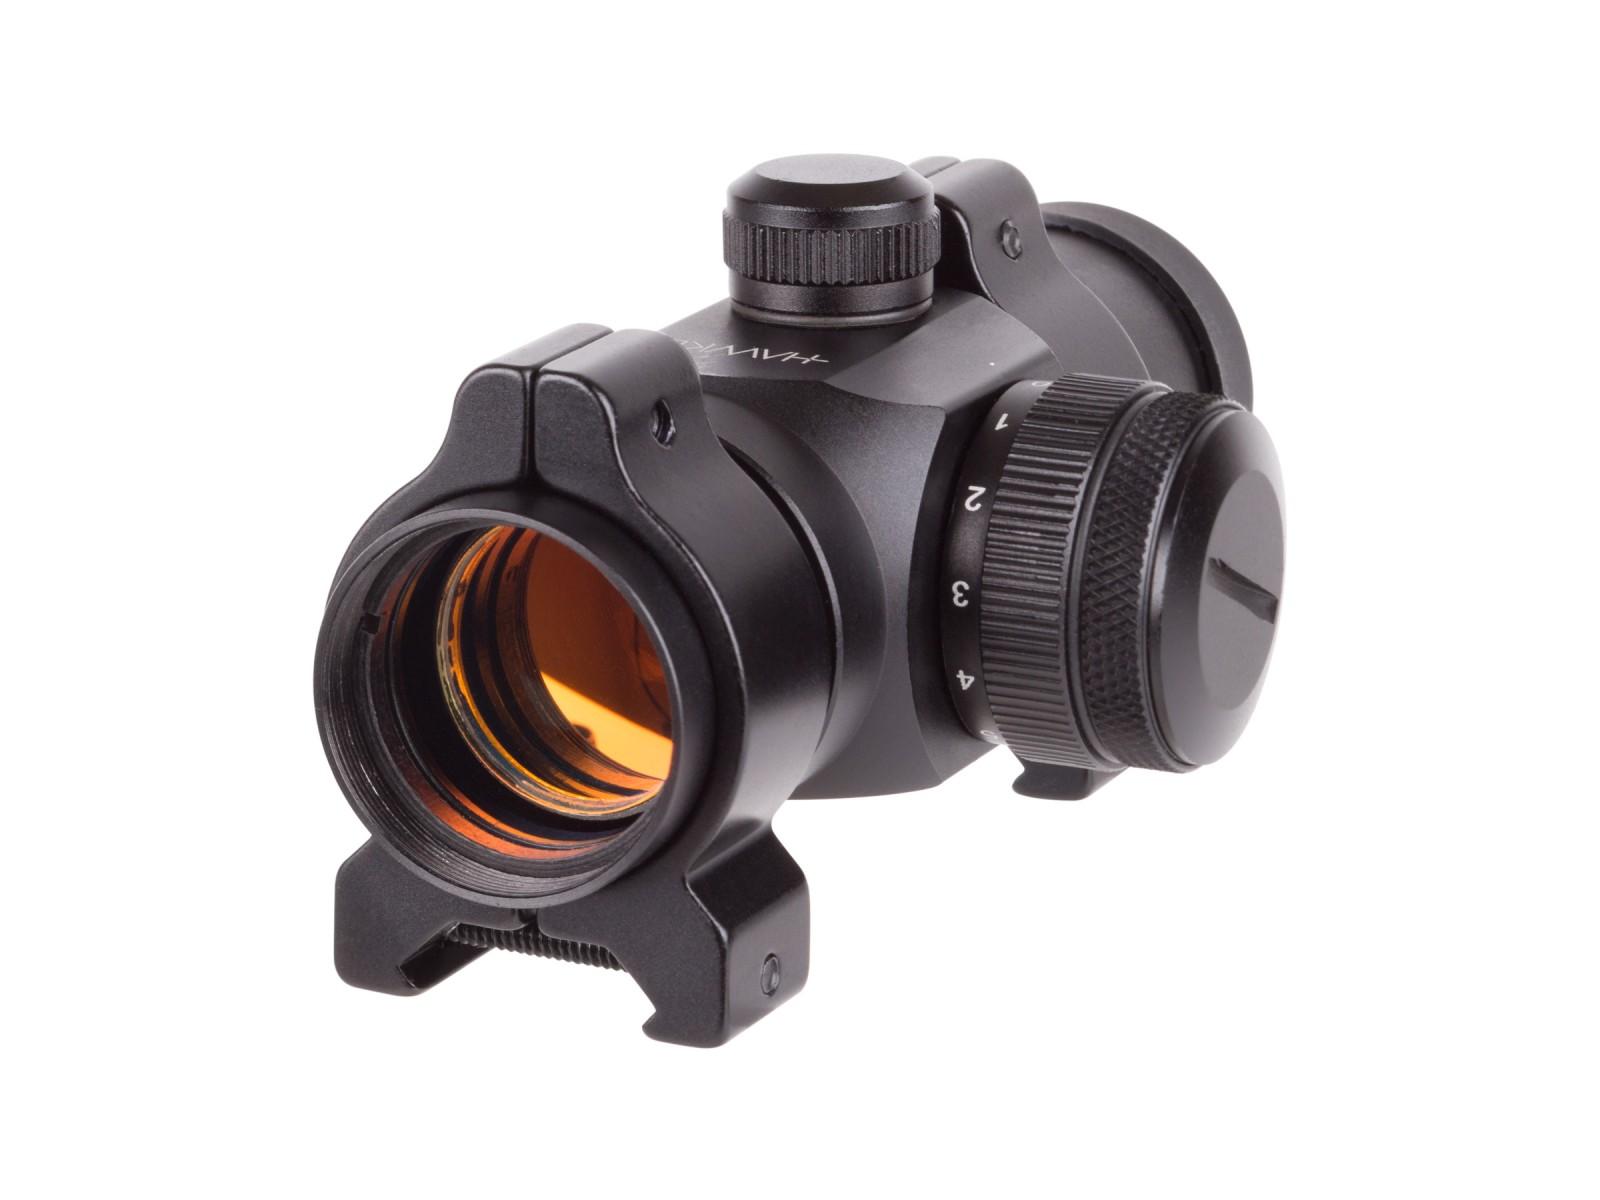 Hawke Sports Optic Reflex Sight, 4 MOA Red Dot, Weaver Mount